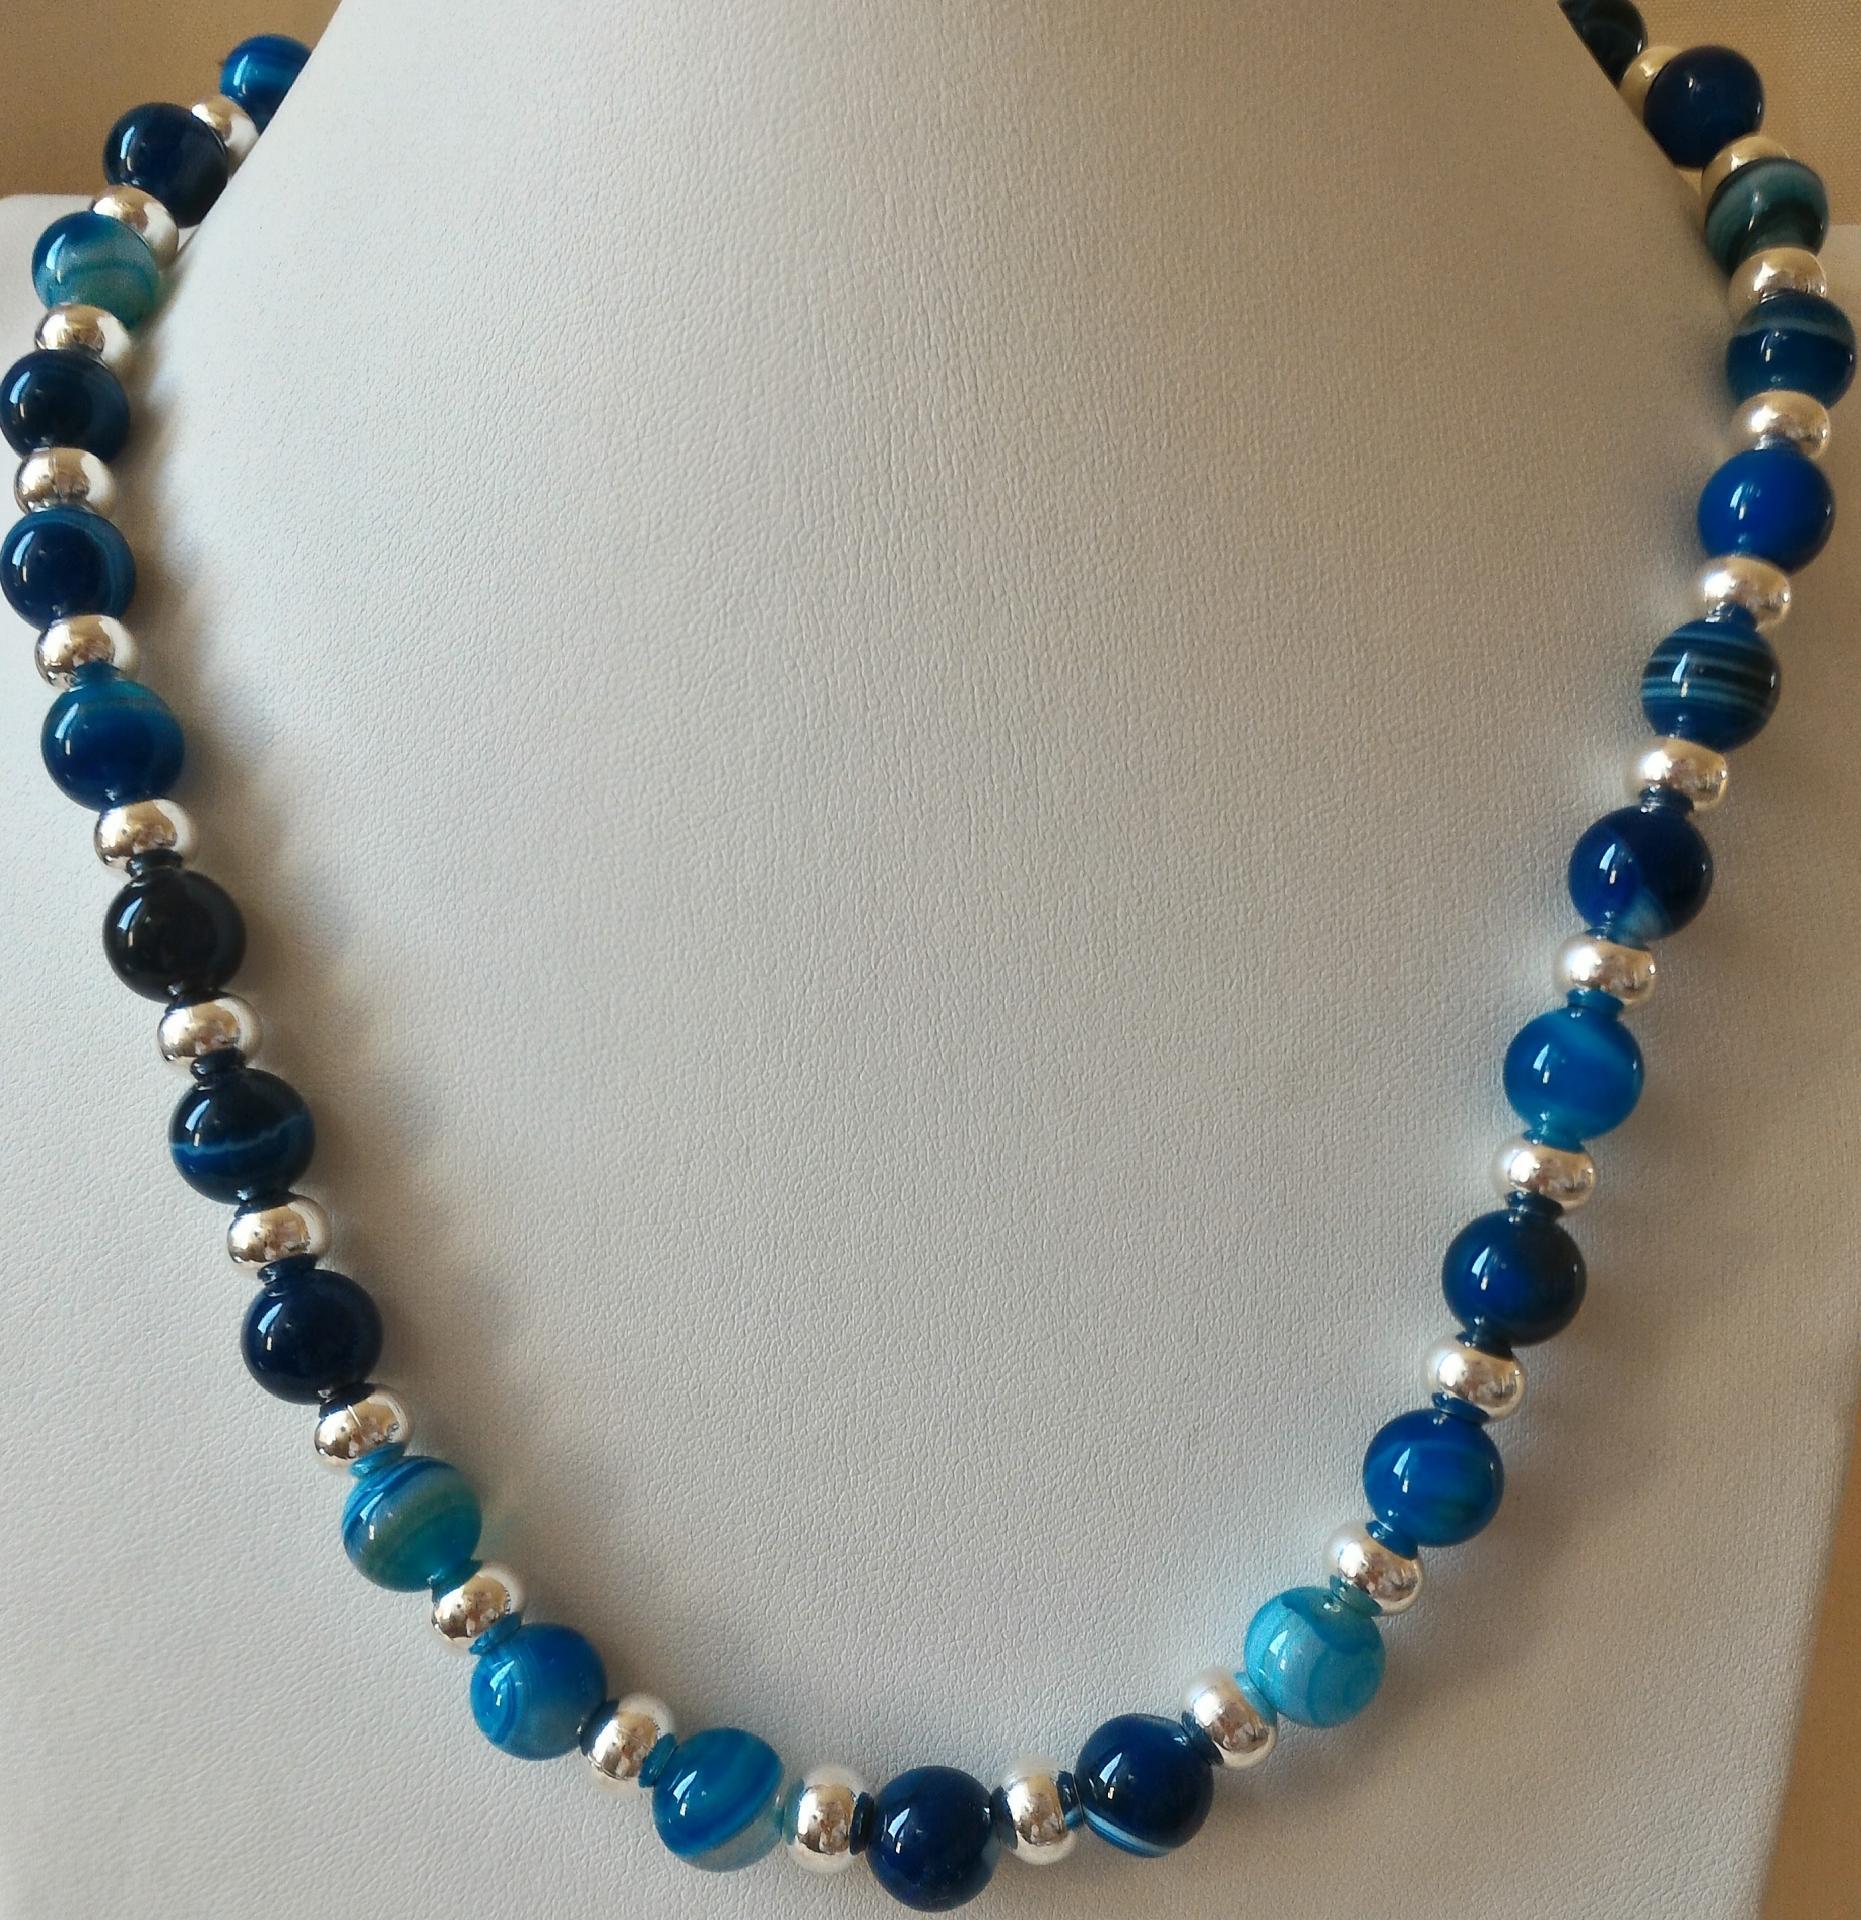 Collier agate bleue 2